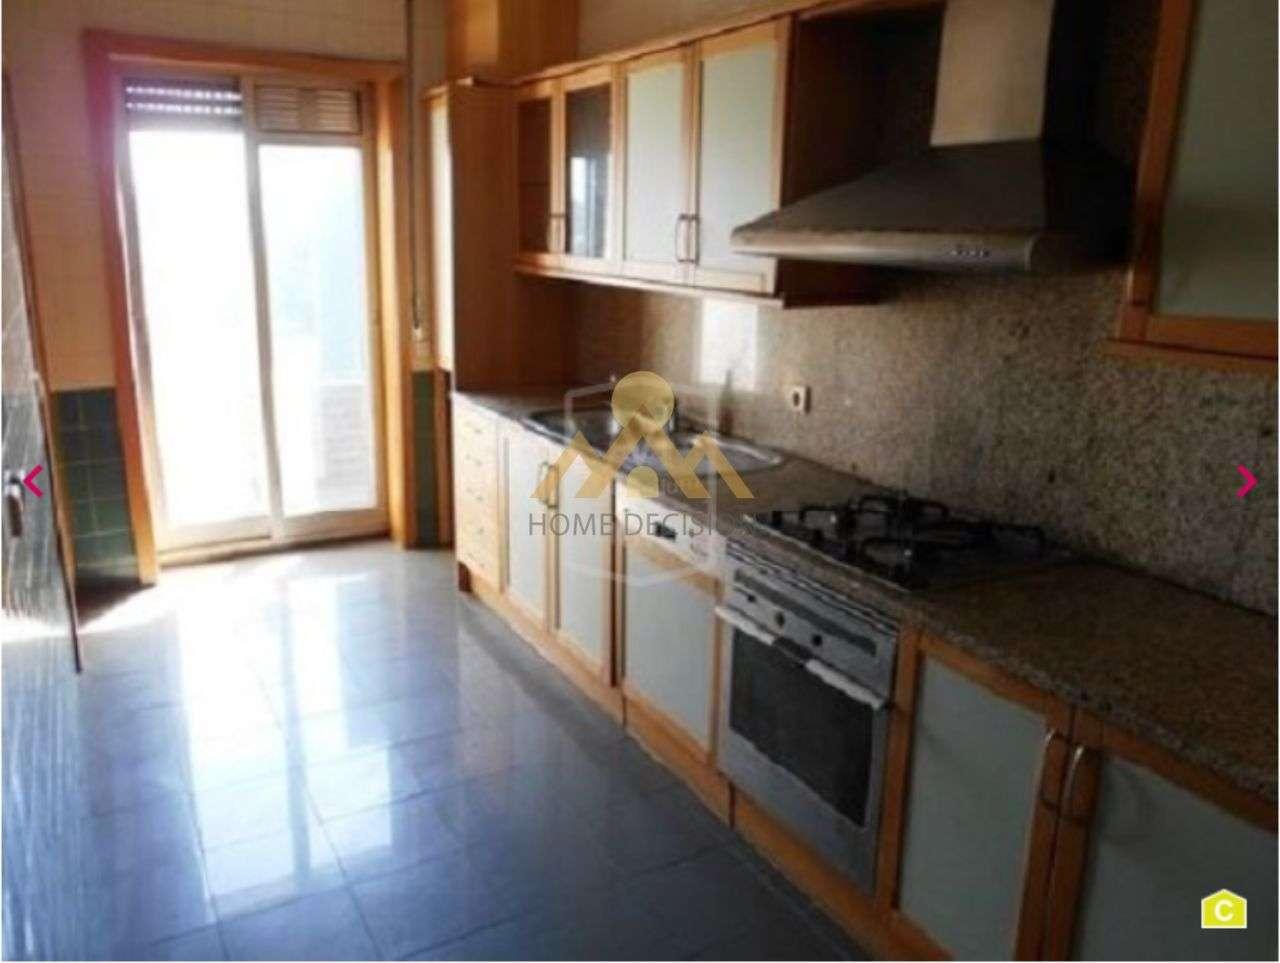 Apartamento para comprar, Nogueira e Silva Escura, Porto - Foto 1